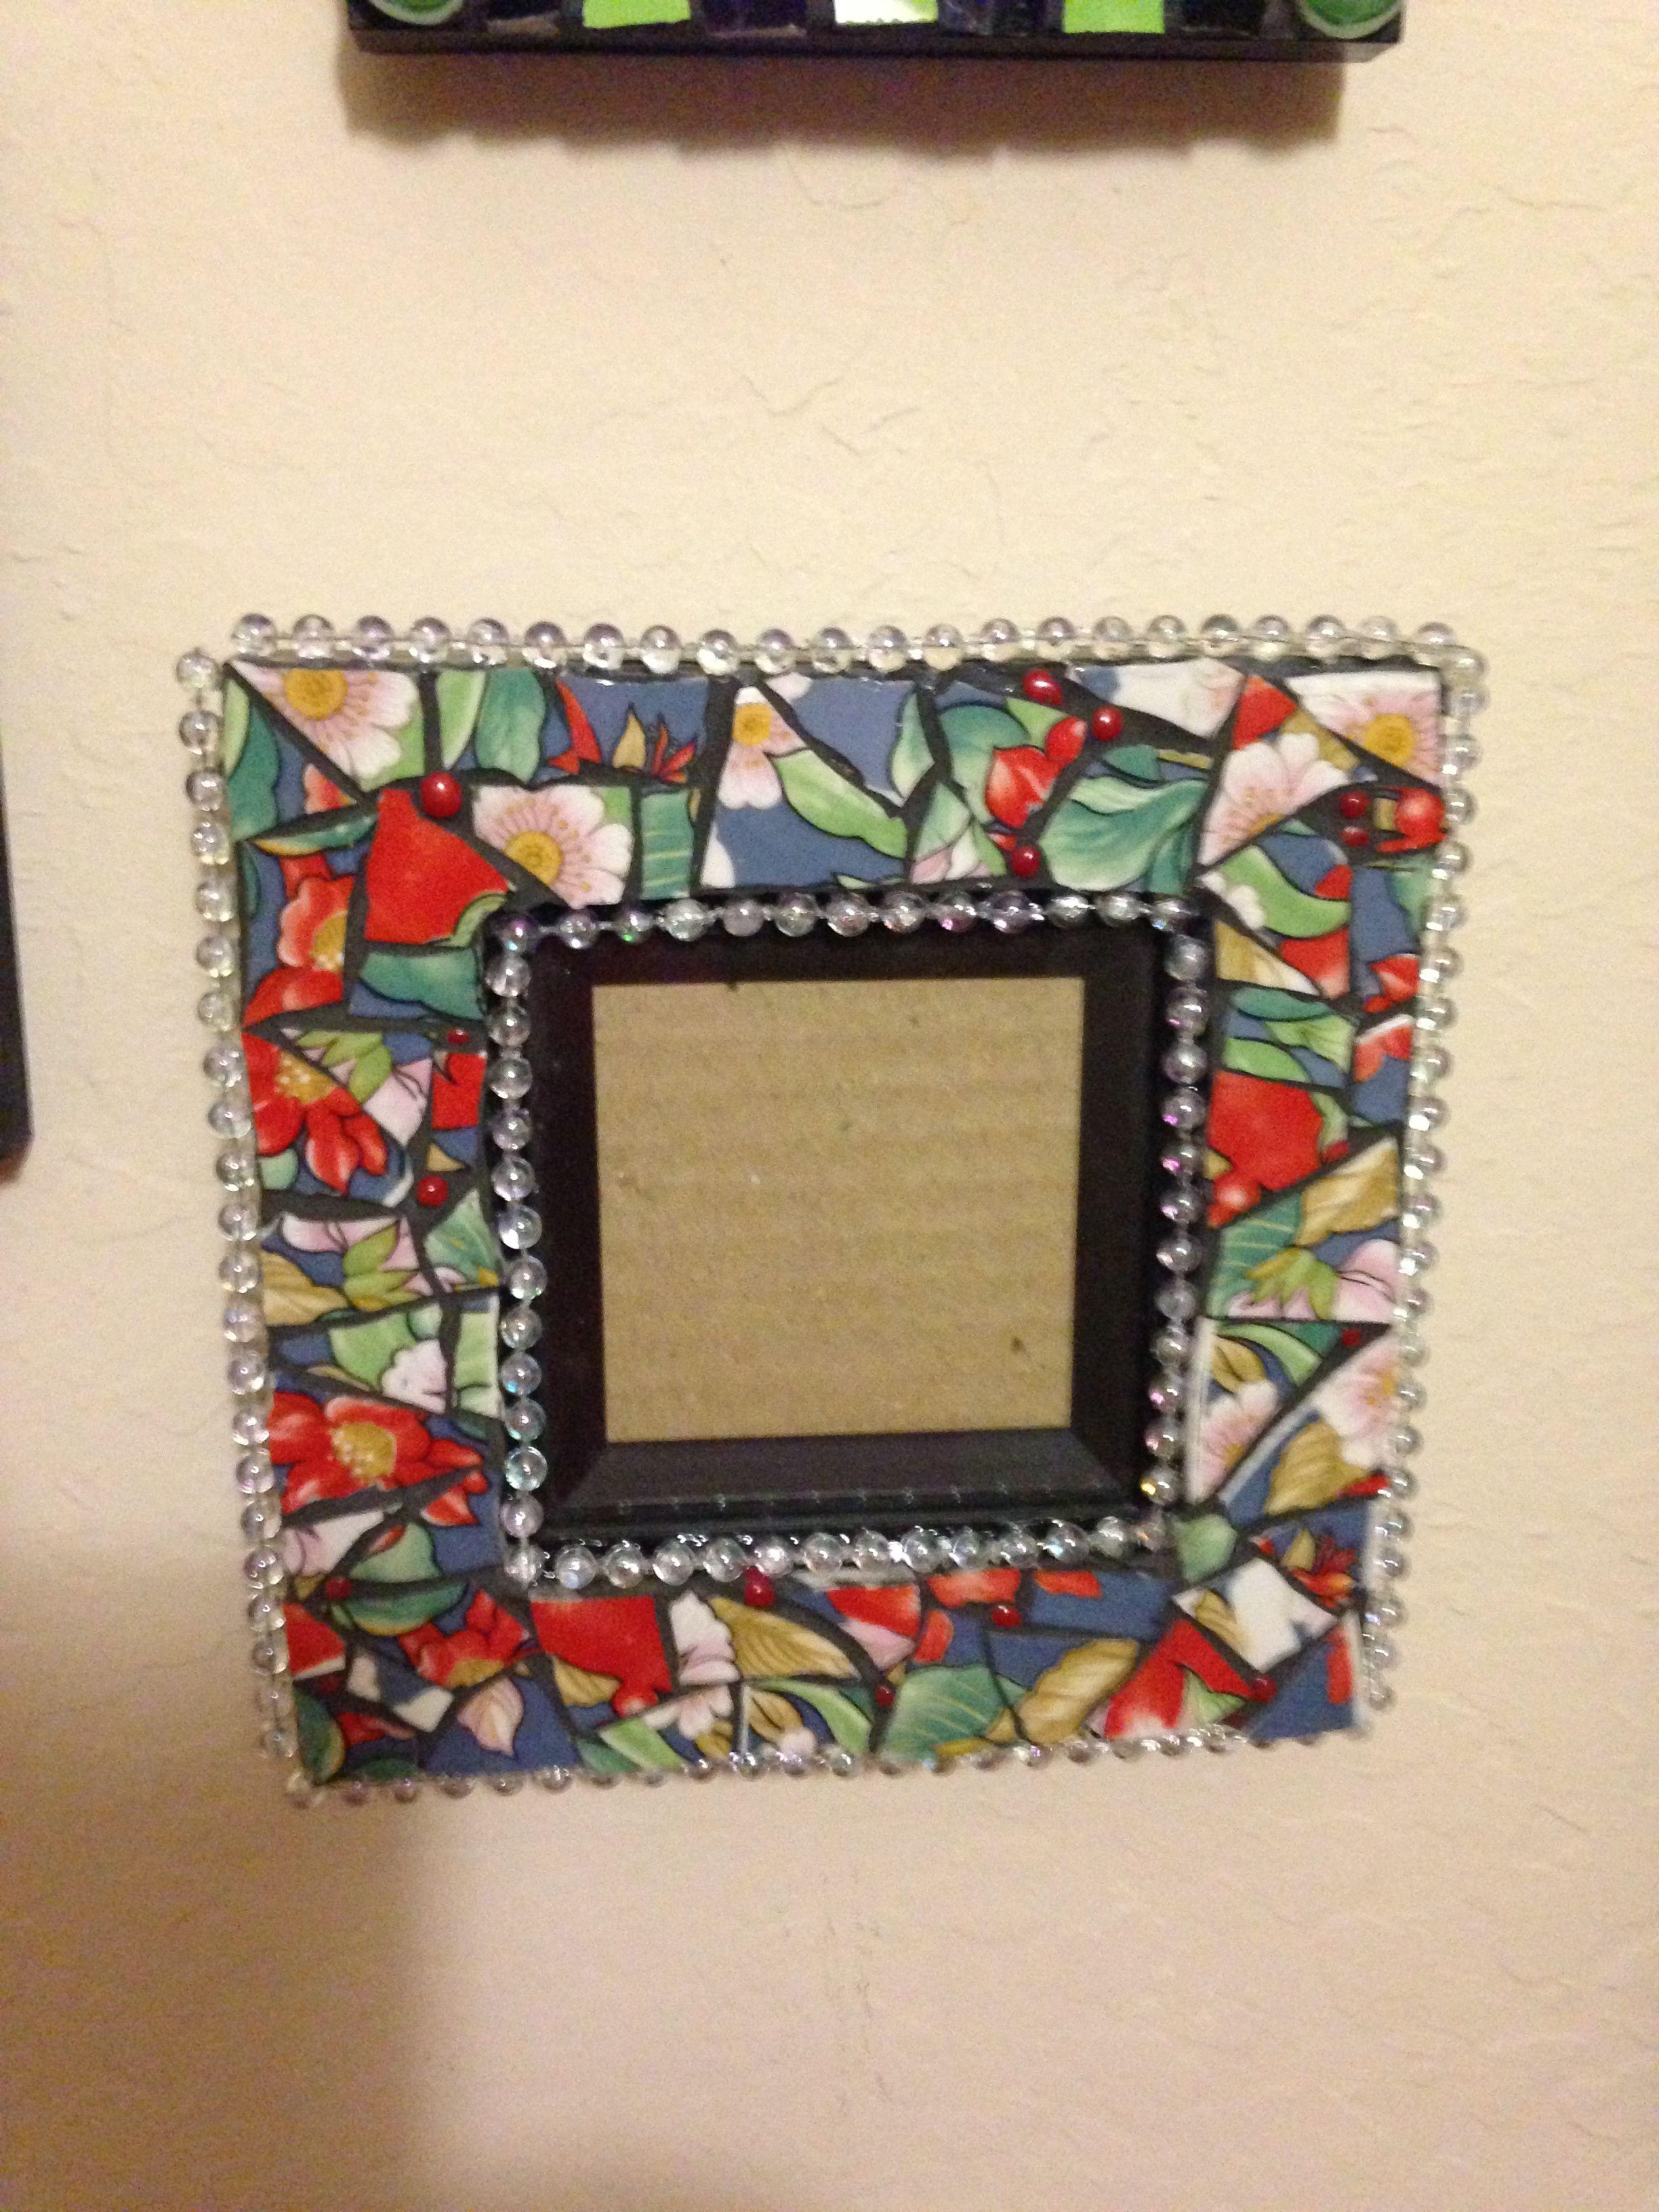 Mosaic frame @Lori Bearden Farris Putze-Parsons   Mosaic Frames and ...